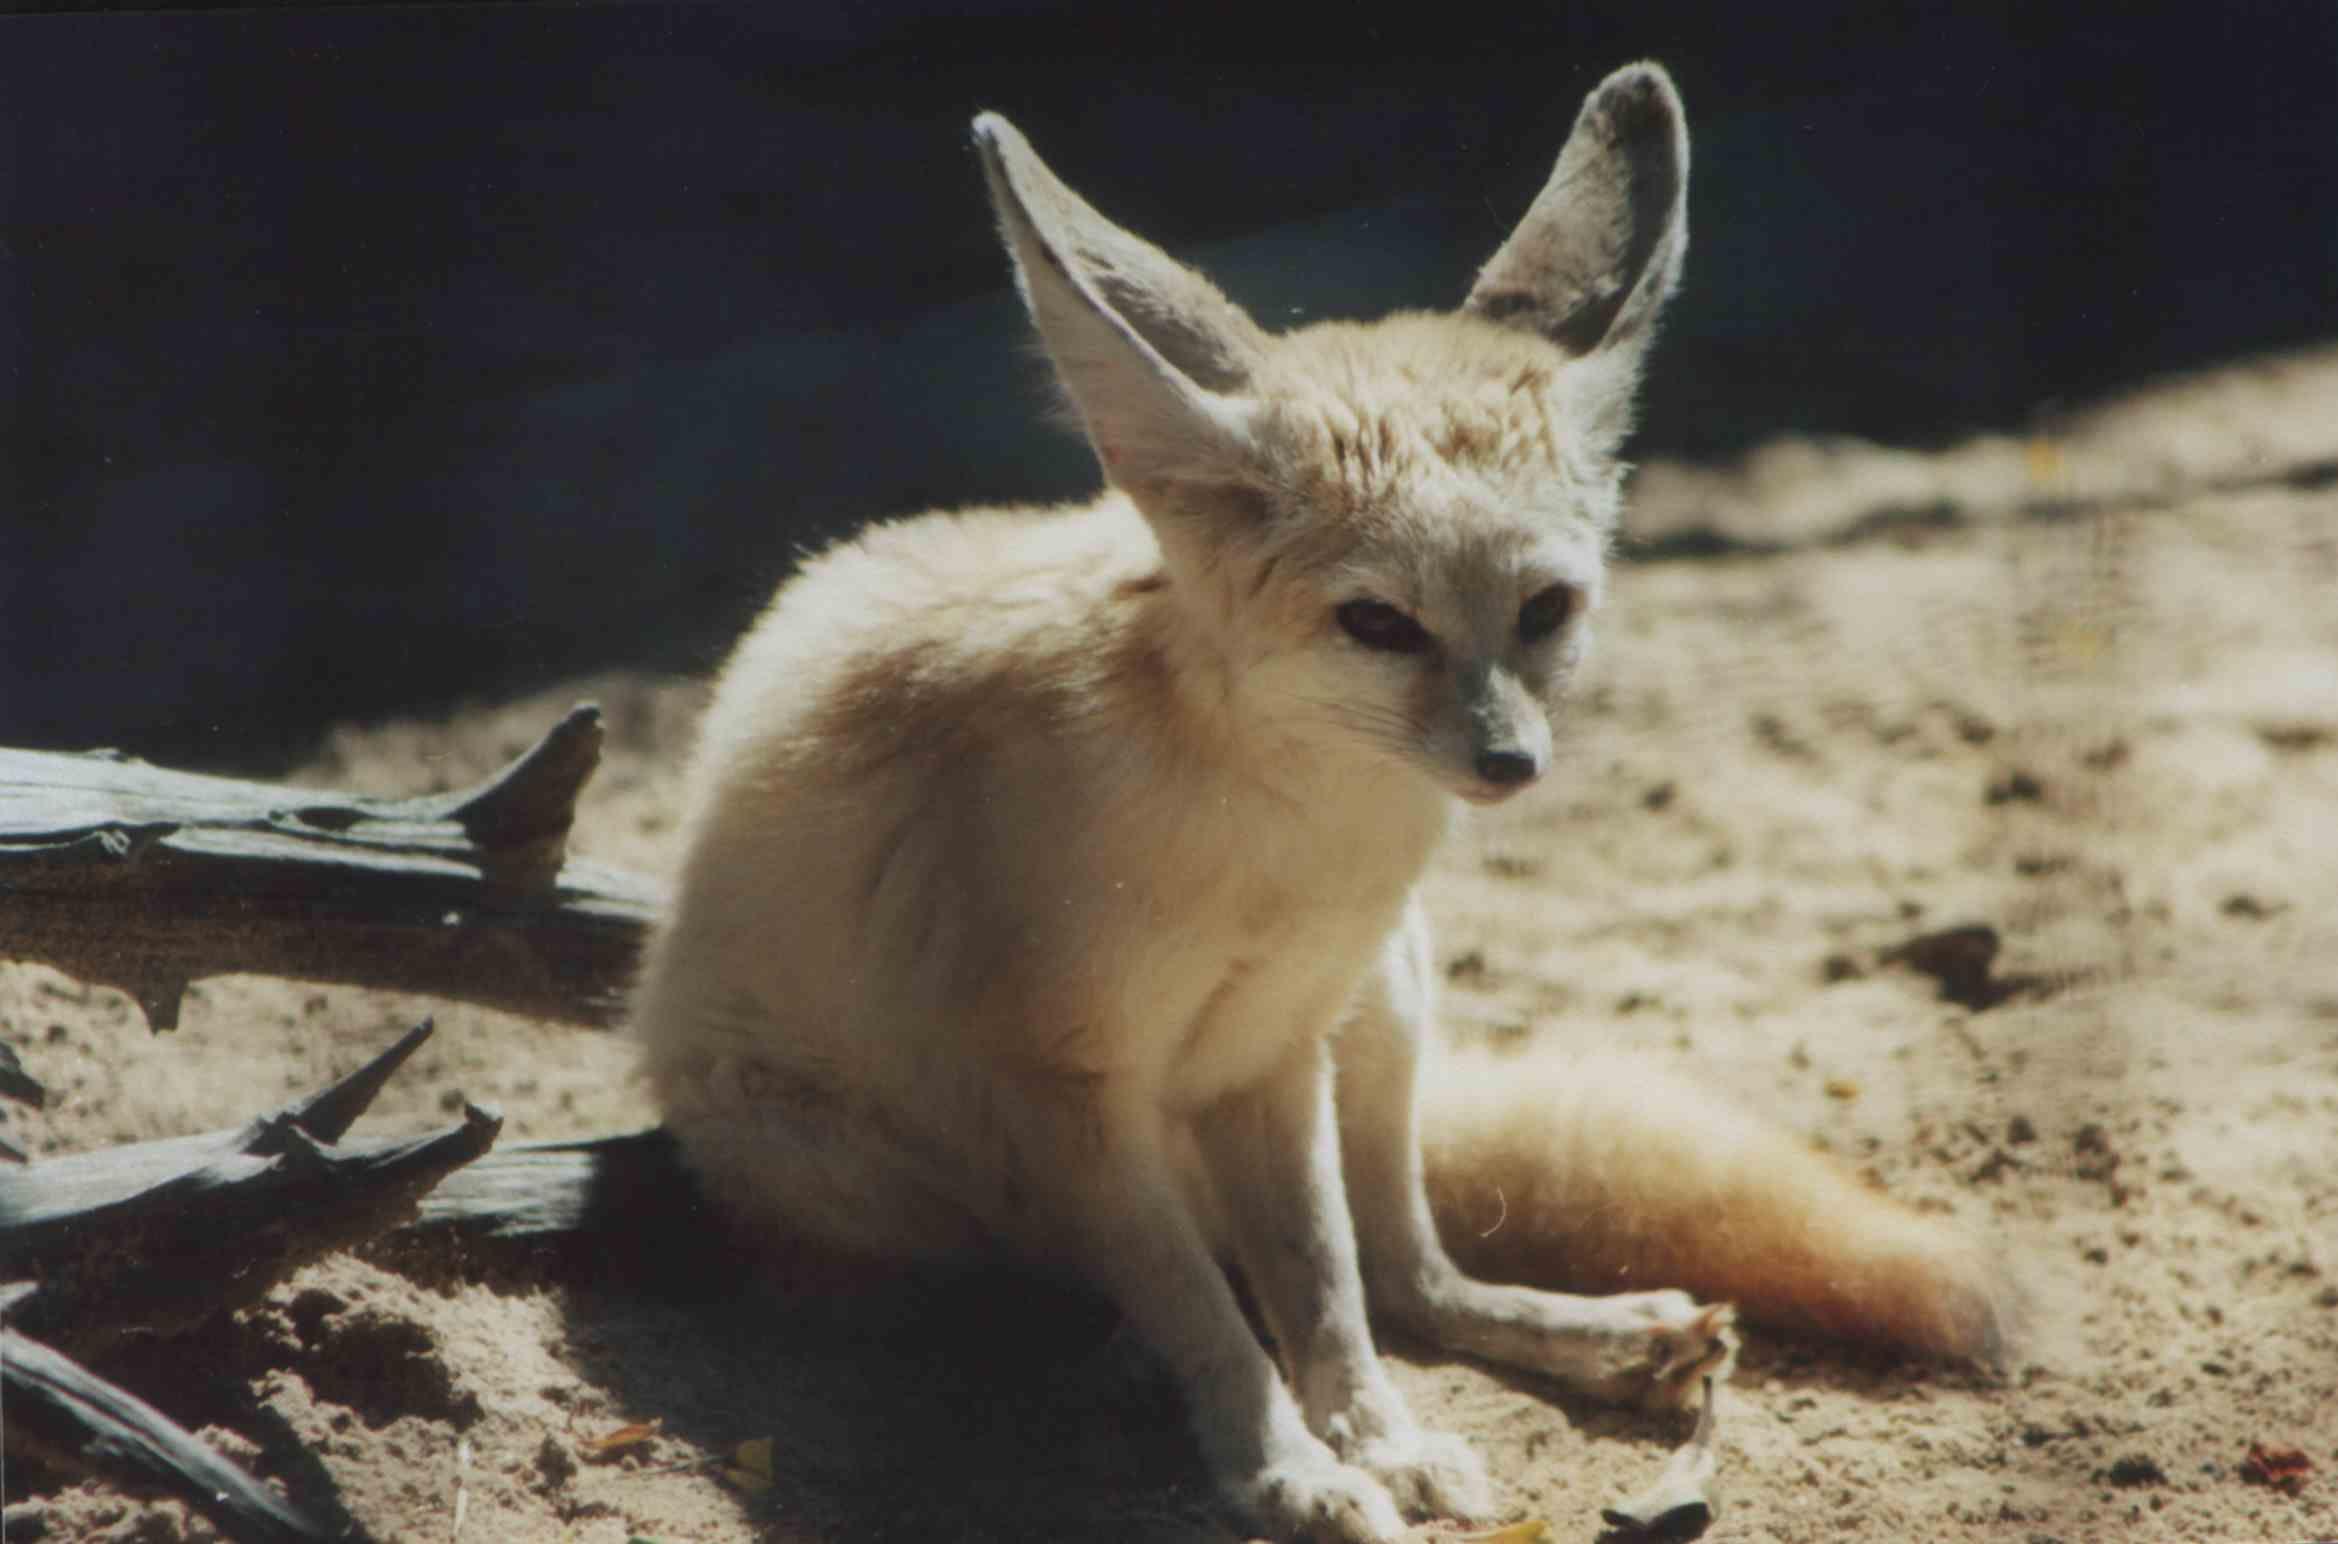 """The Fennec Fox (Vulpes zerda) is a small nocturnal fox"